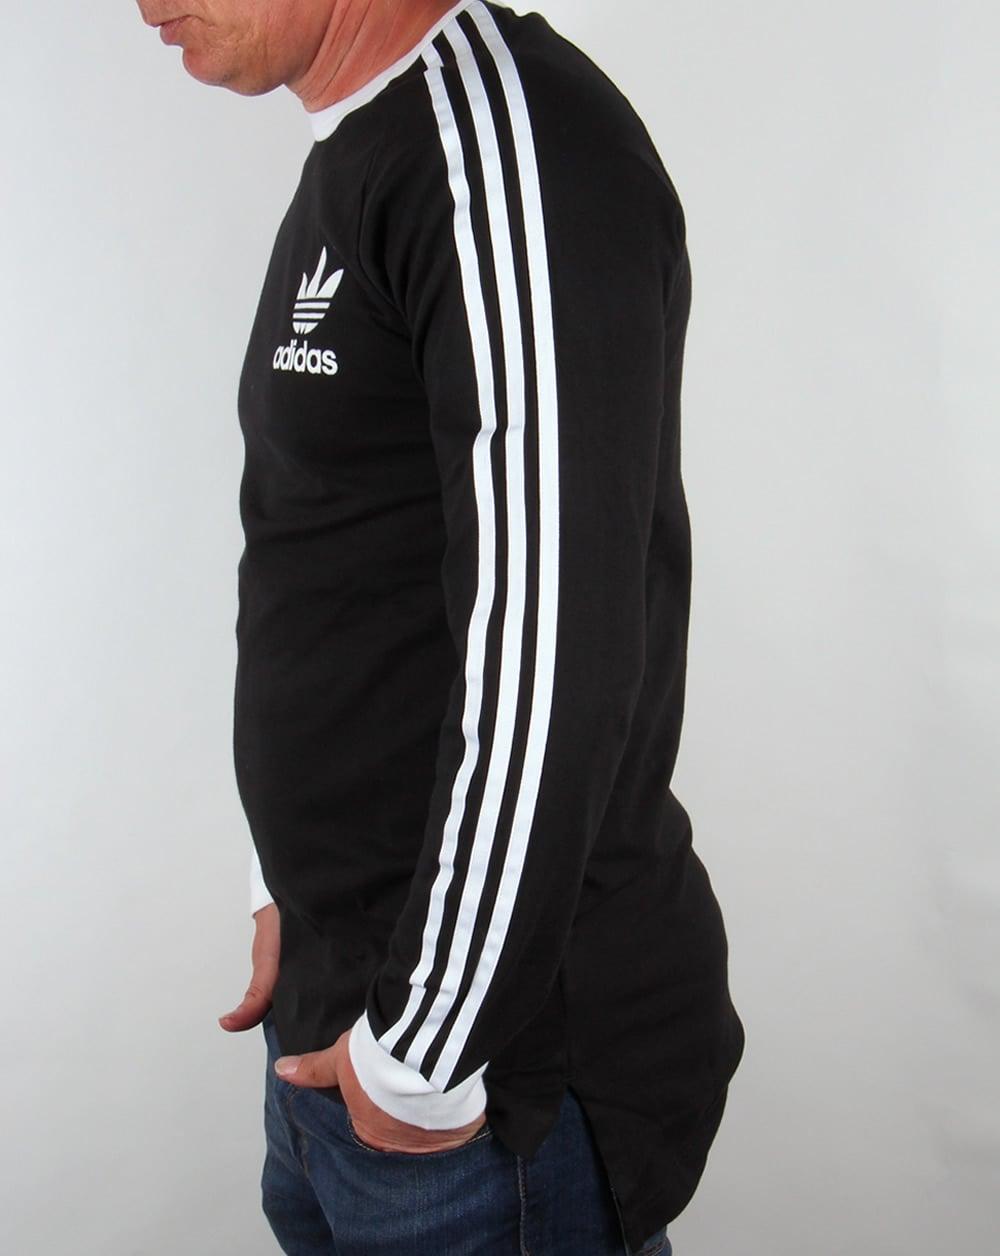 bc3487681 Adidas Originals Adicolour Long Sleeve T-shirt Black/White - T ...